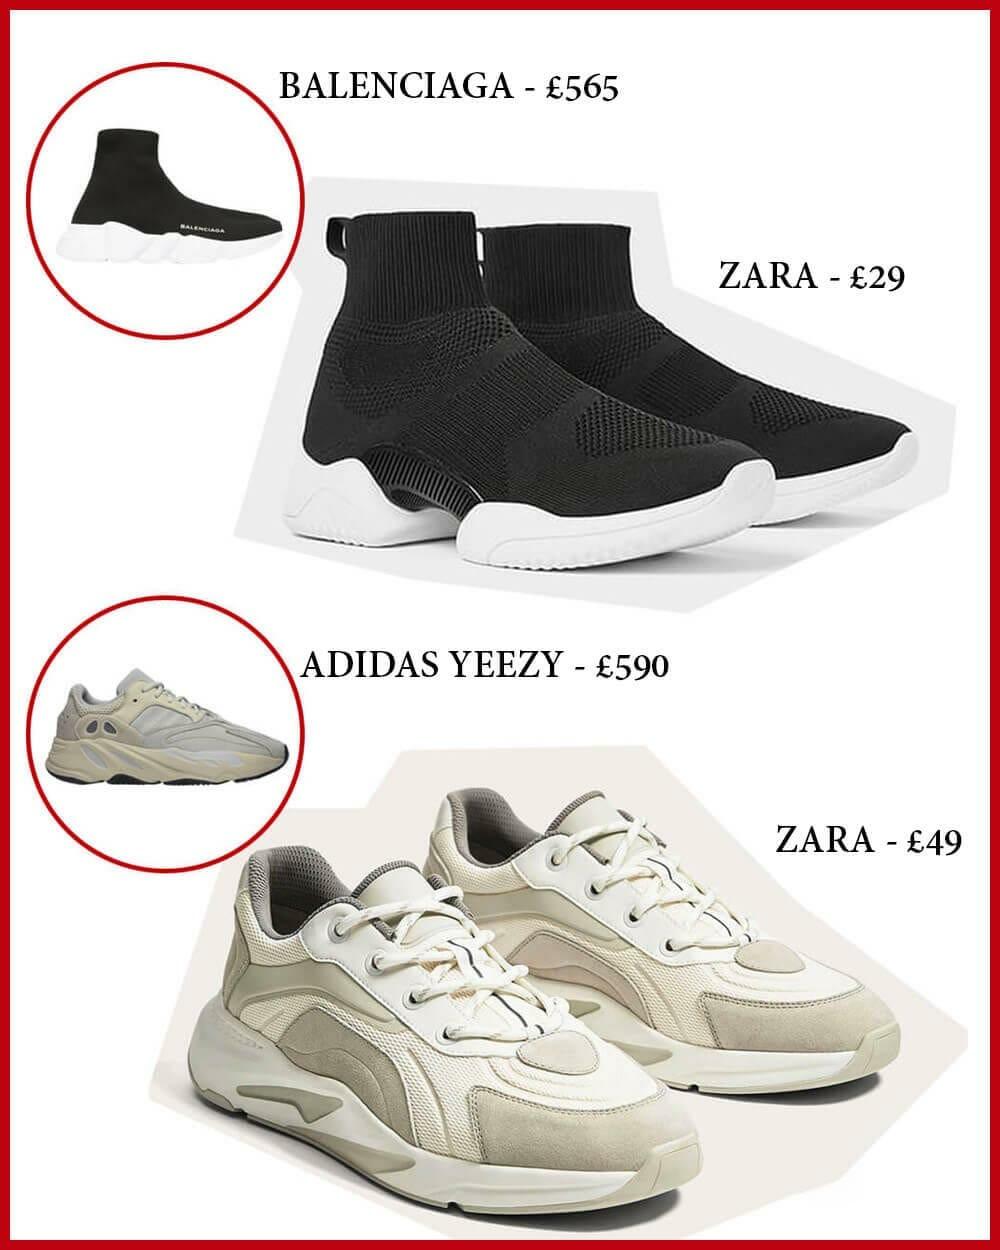 Fast Fashion ZARA copying Balenciaga and Yeezy